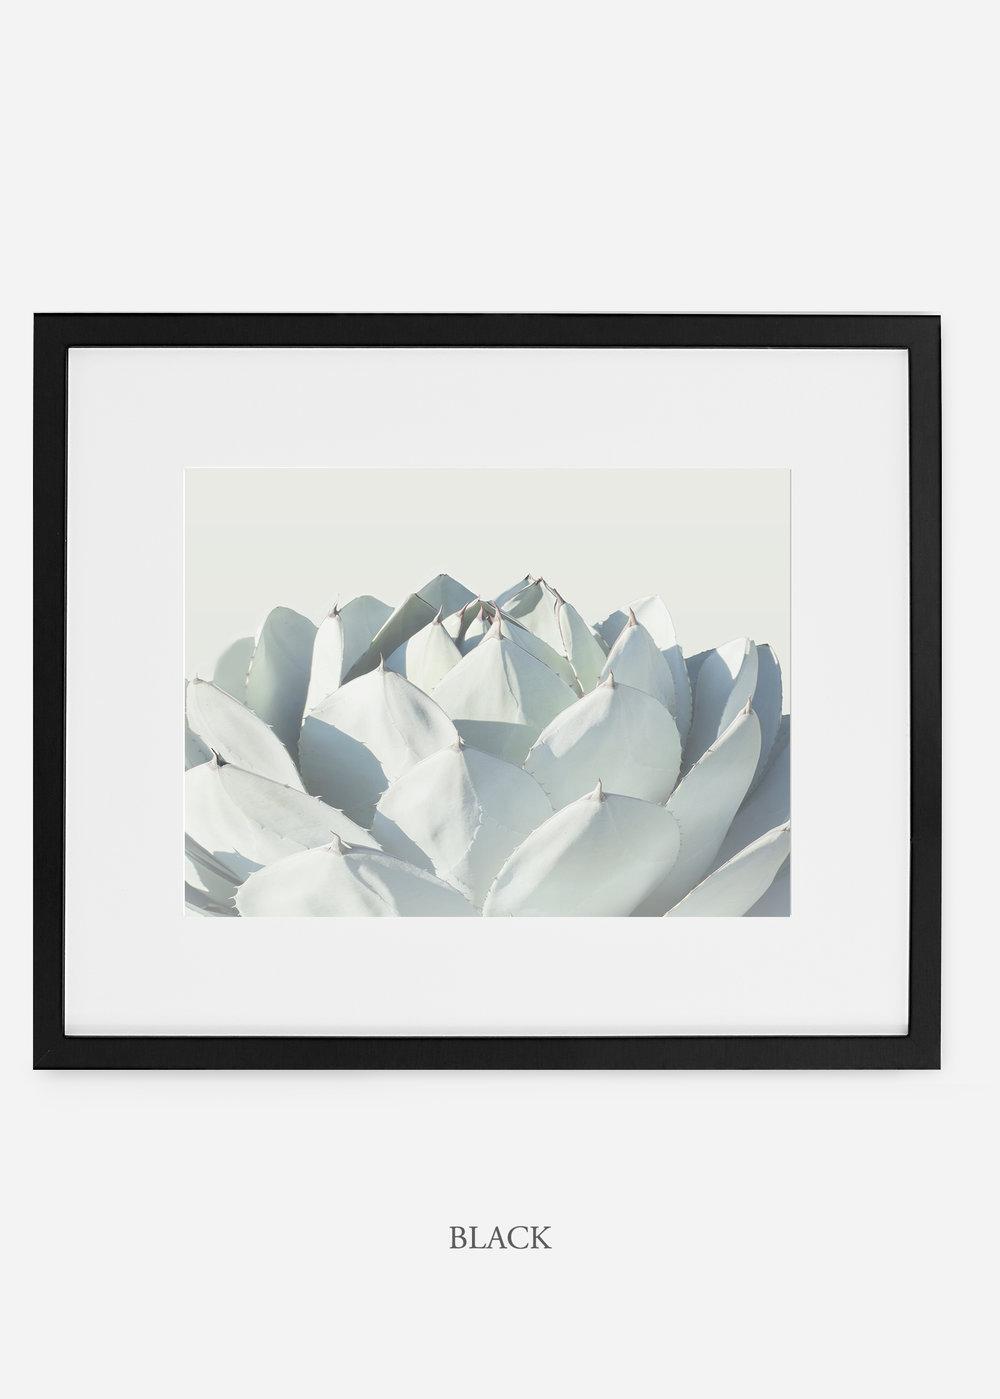 WilderCalifornia_blackframe_Cactus_Art_Photography_interiordesign_white_bohemian_neutral_photography_photo.jpg